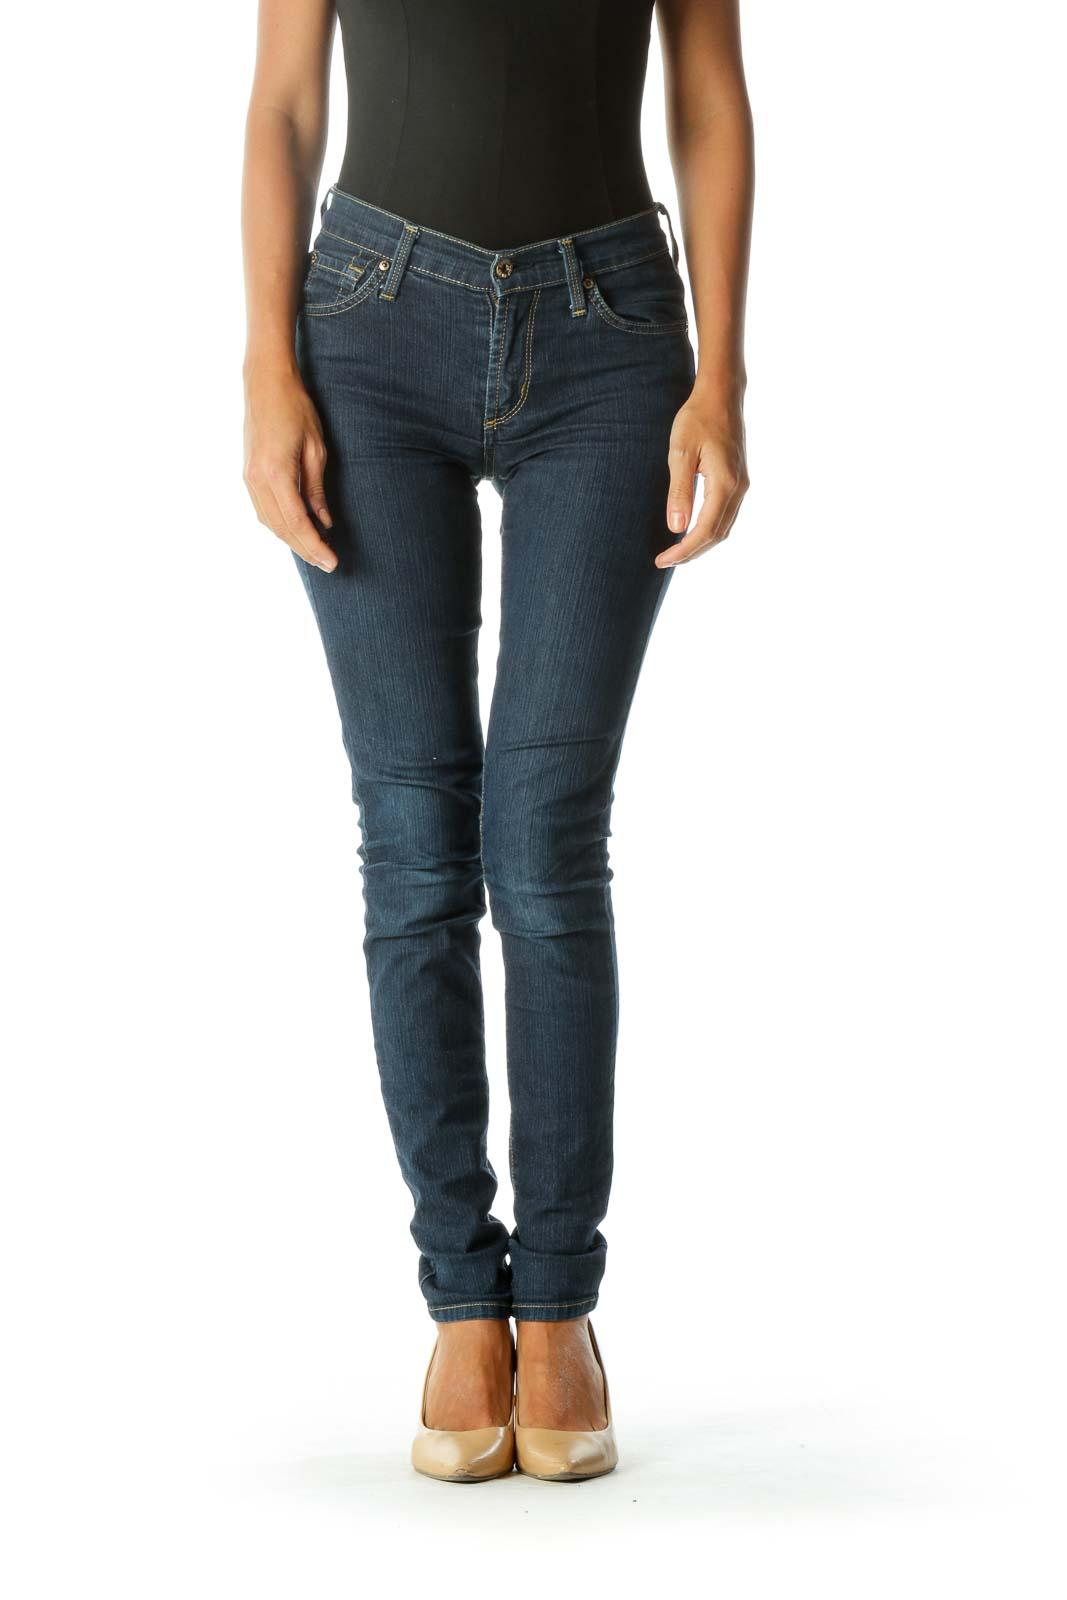 Blue Skinny Medium-Wash Jeans Front